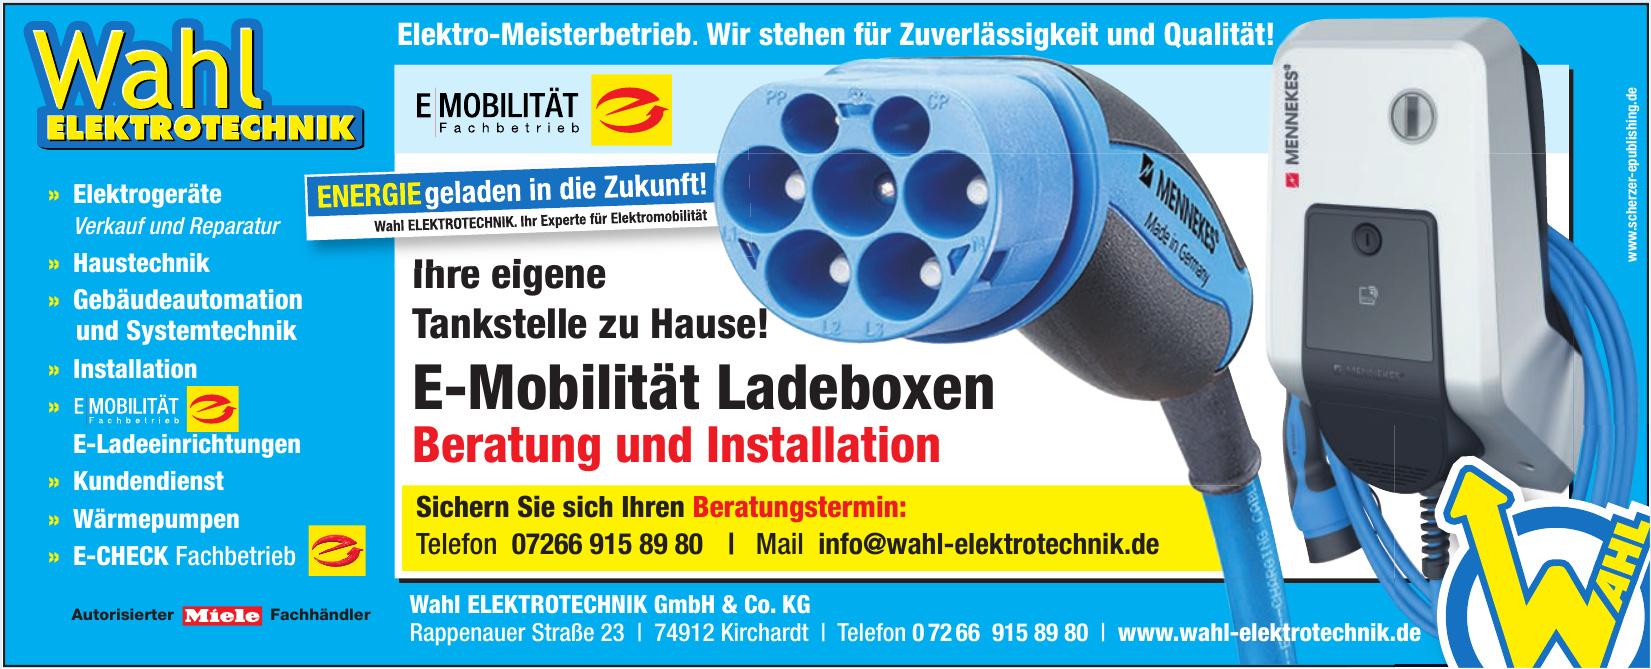 Wahl ELEKTROTECHNIK GmbH & Co. KG